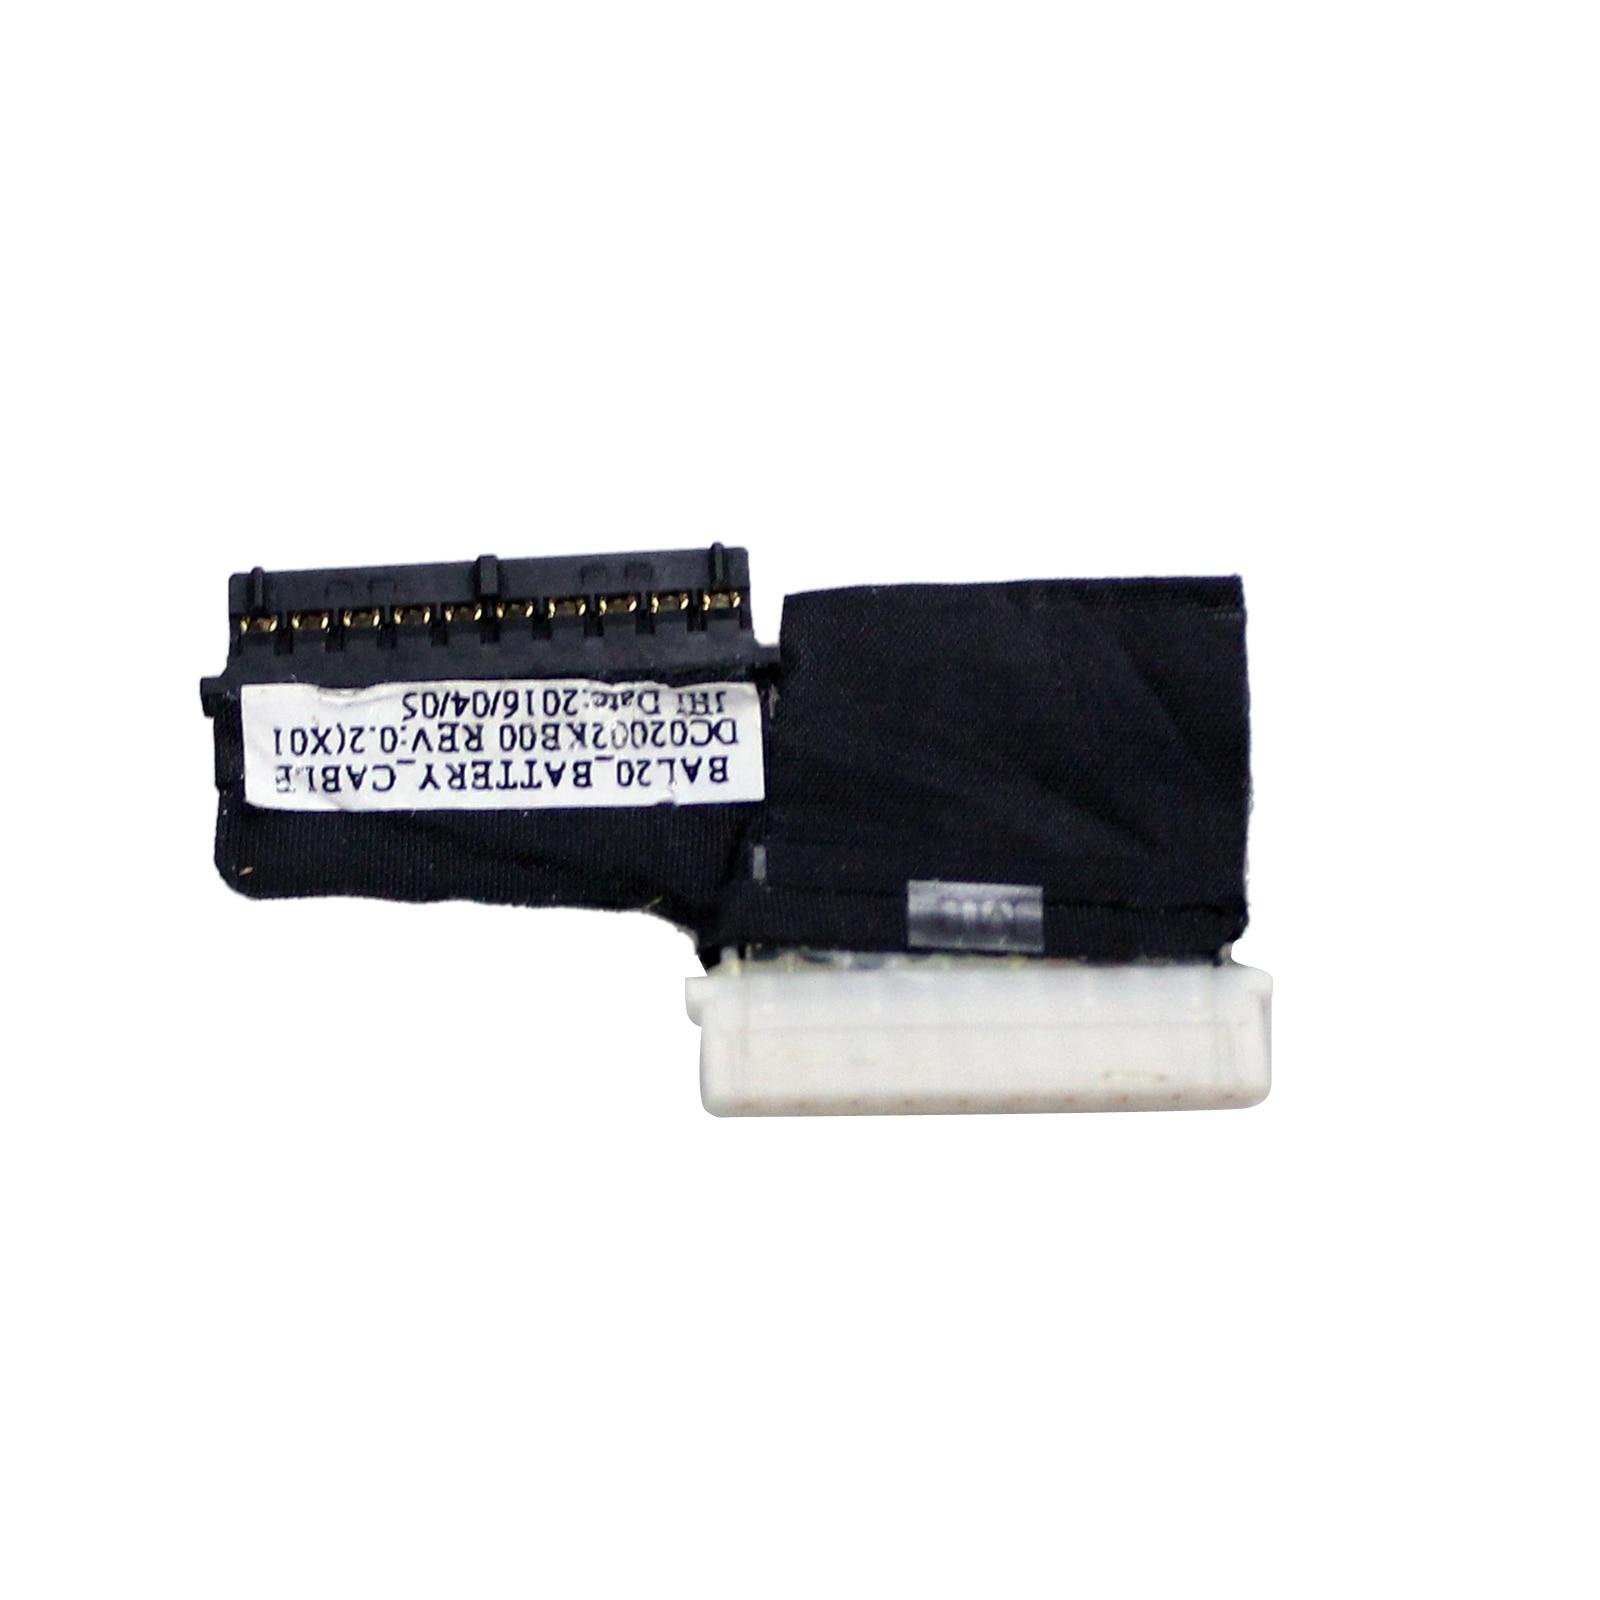 Cable de batería de alambre para Dell Inspiron 5565 15 5567 DC02002MM00 0G0FWX G0FWX